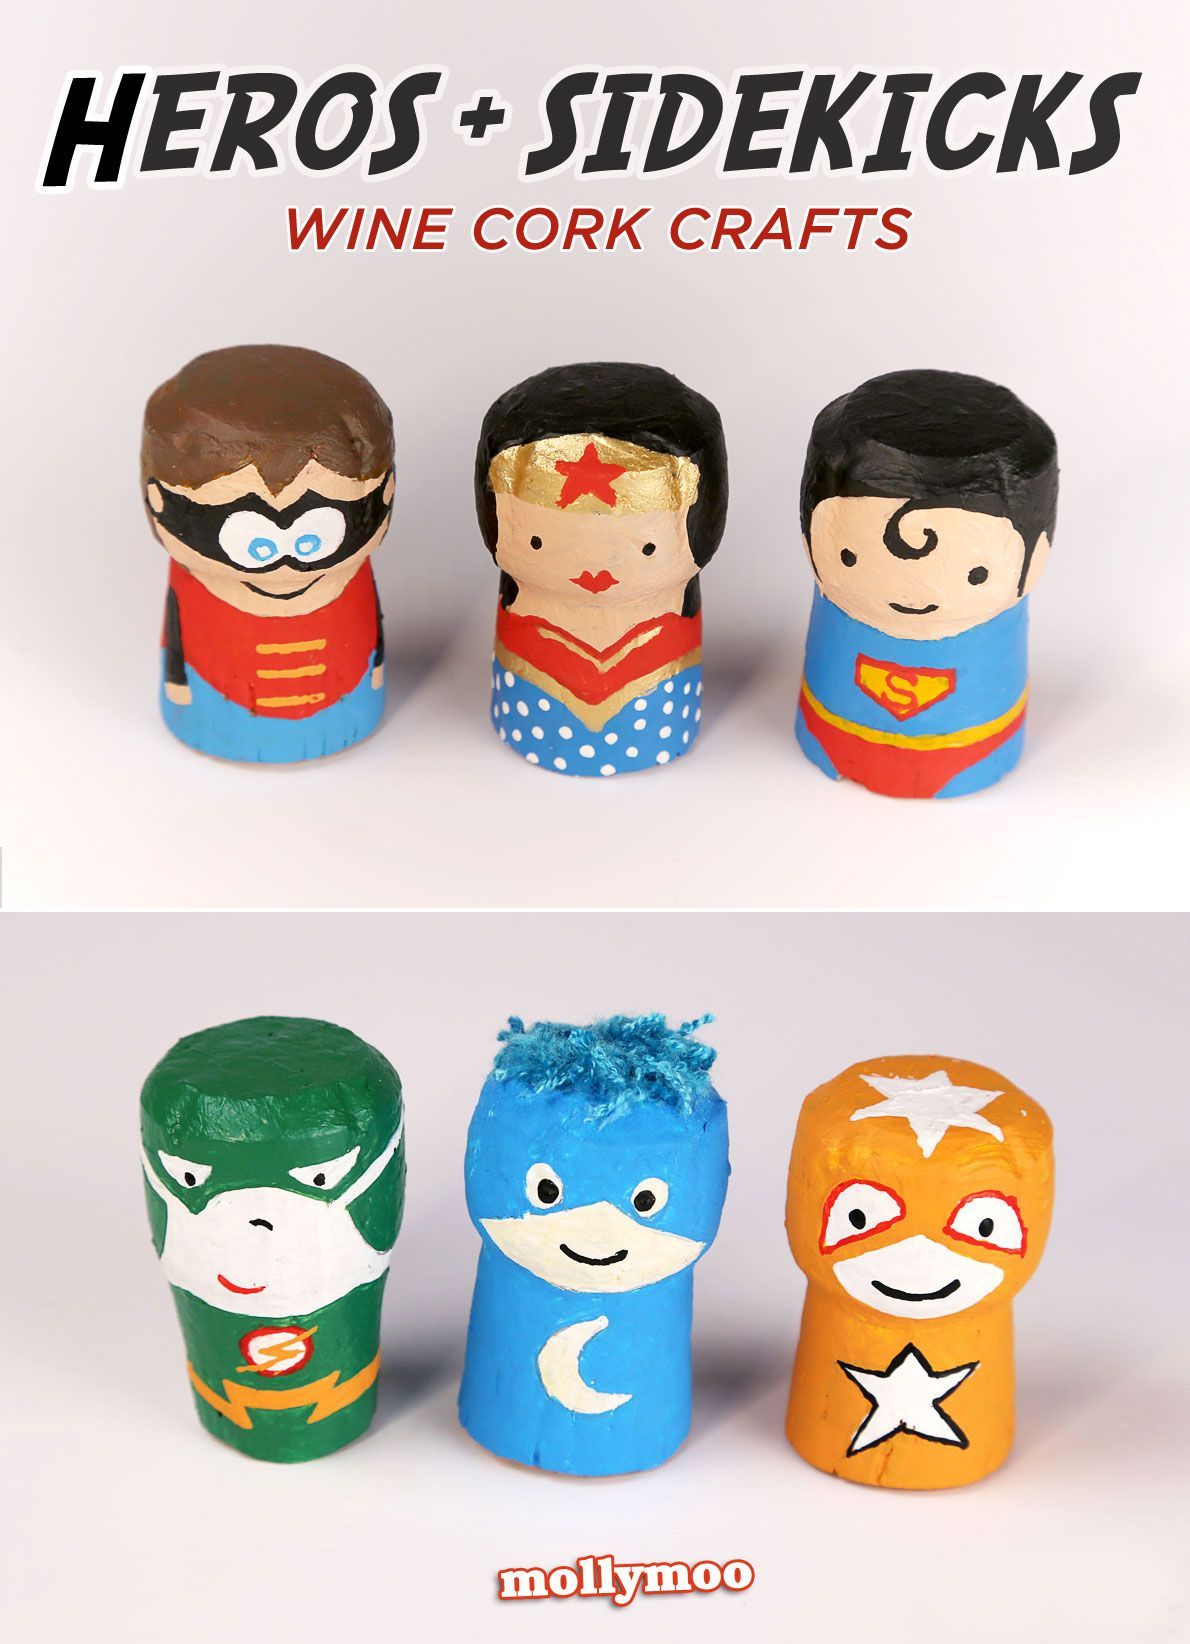 Superhero Crafts - wine cork characters to inspire adventurous play | MollyMoo #superherocrafts